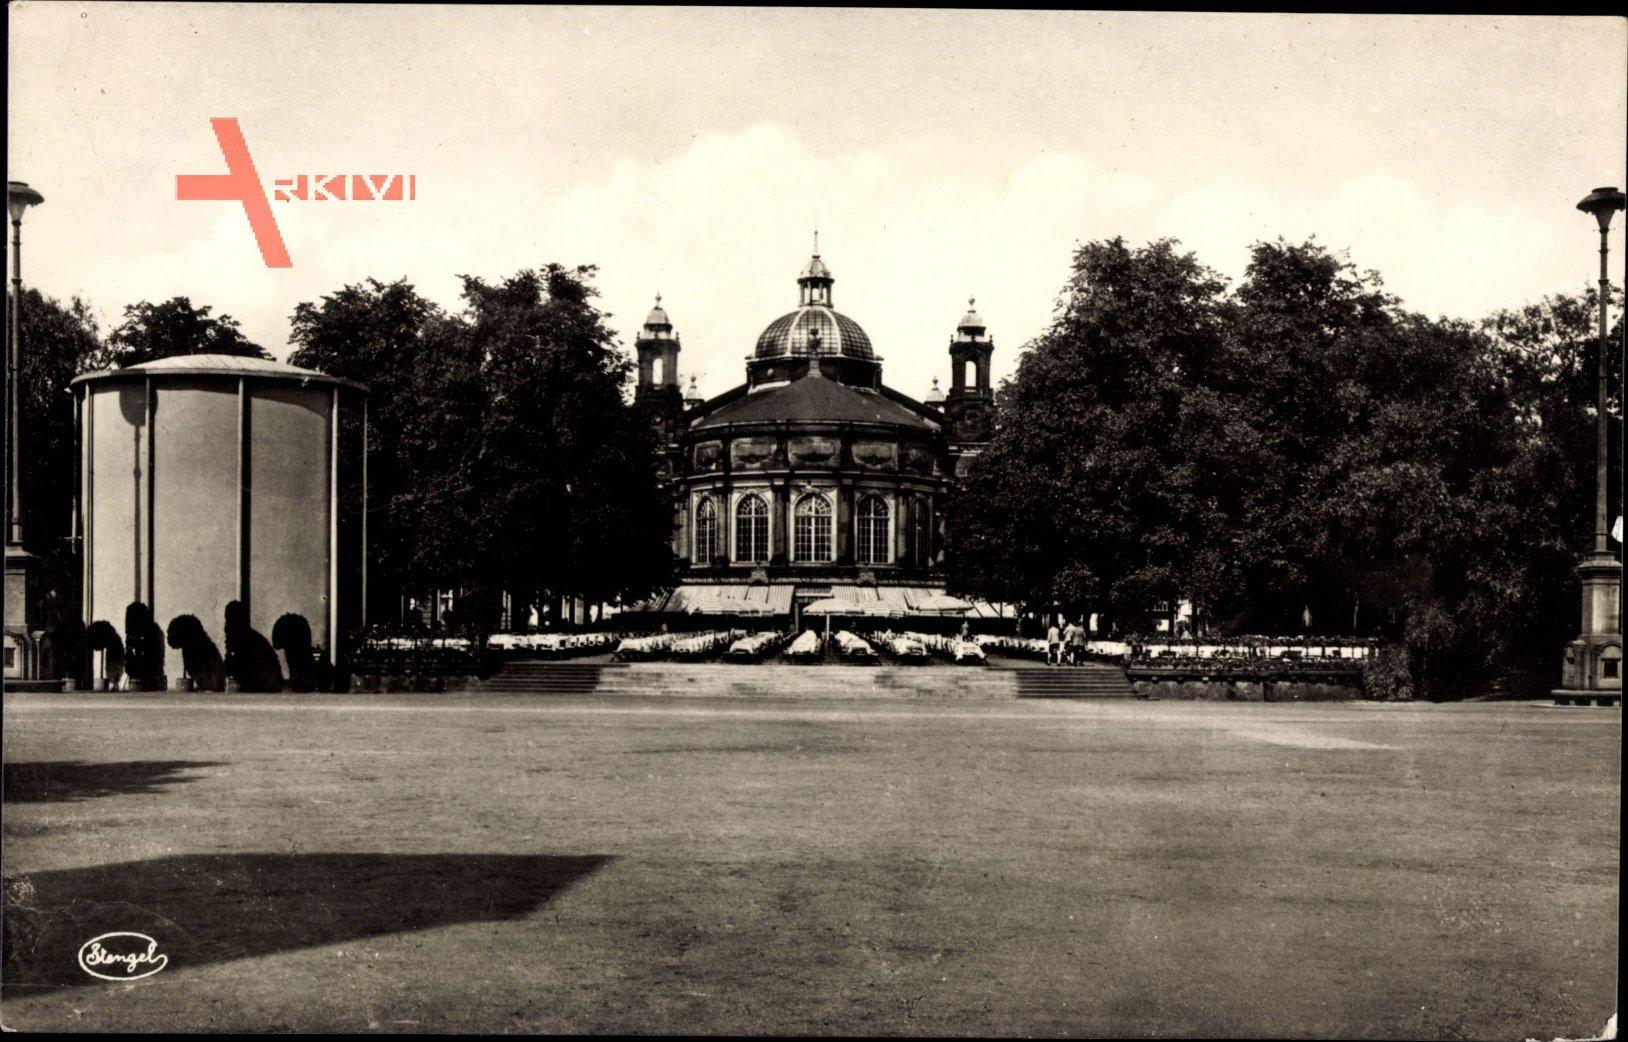 Dresden Zentrum Altstadt, Jahresschau Deutscher Arbeit 1927, Hauptrestaurant